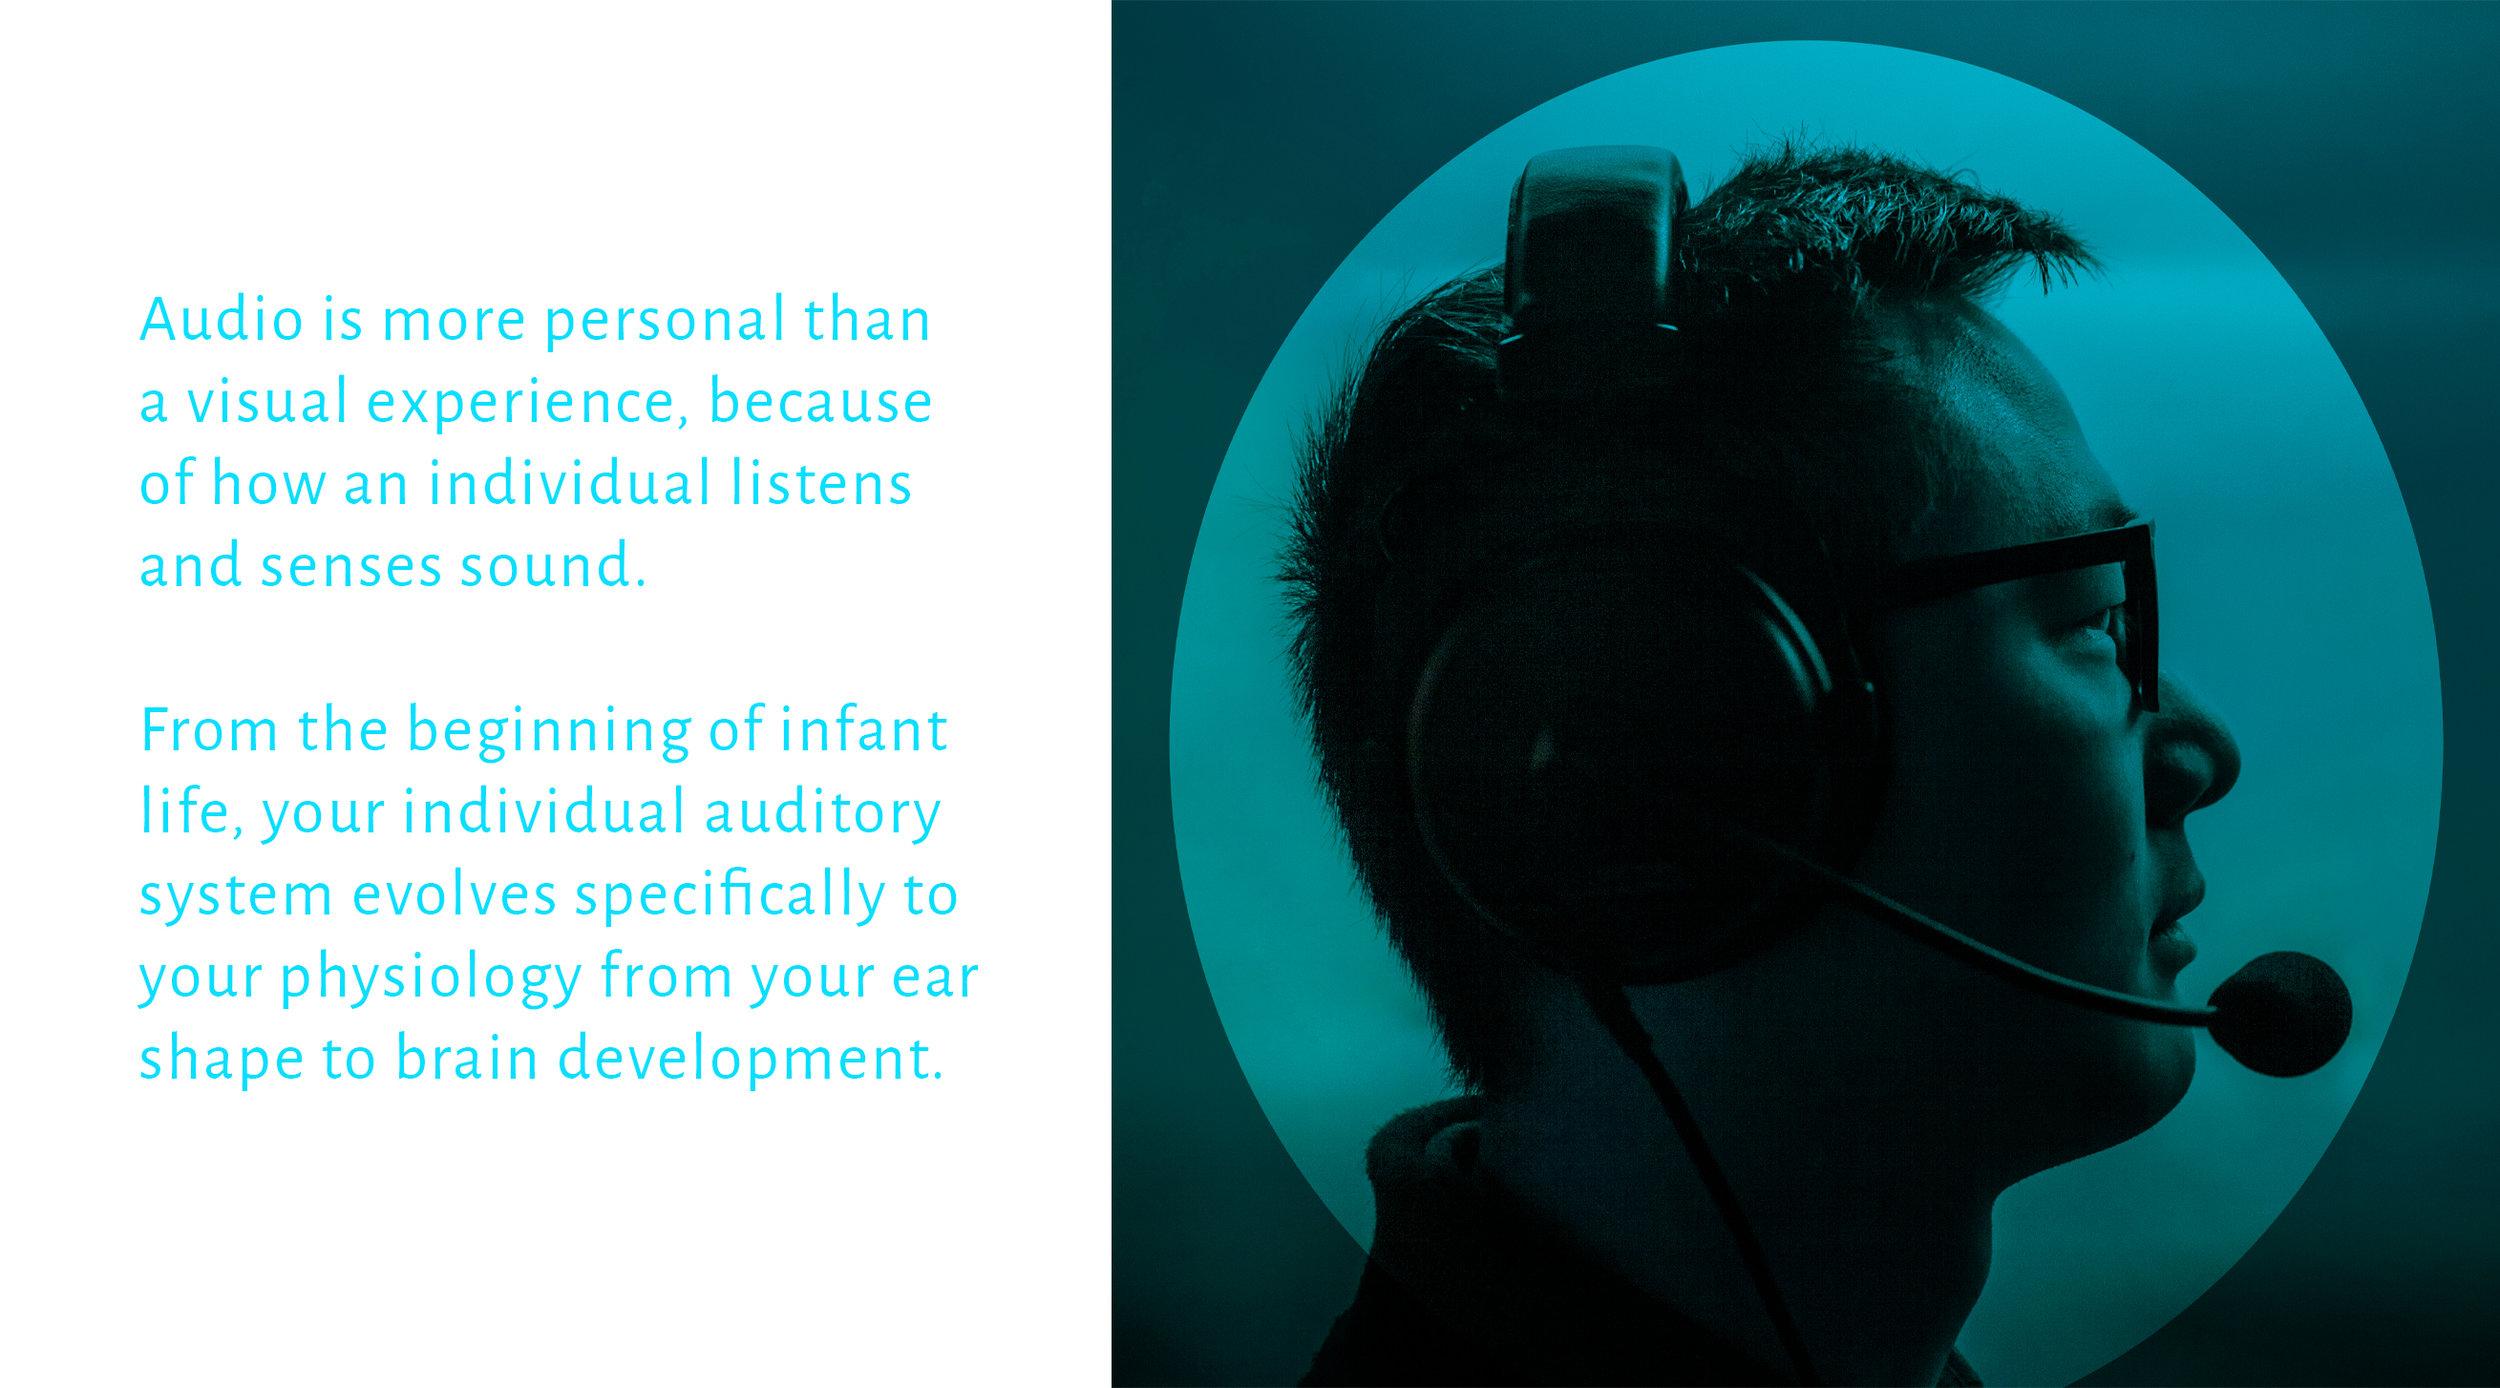 blue profile psa text image 1.jpg